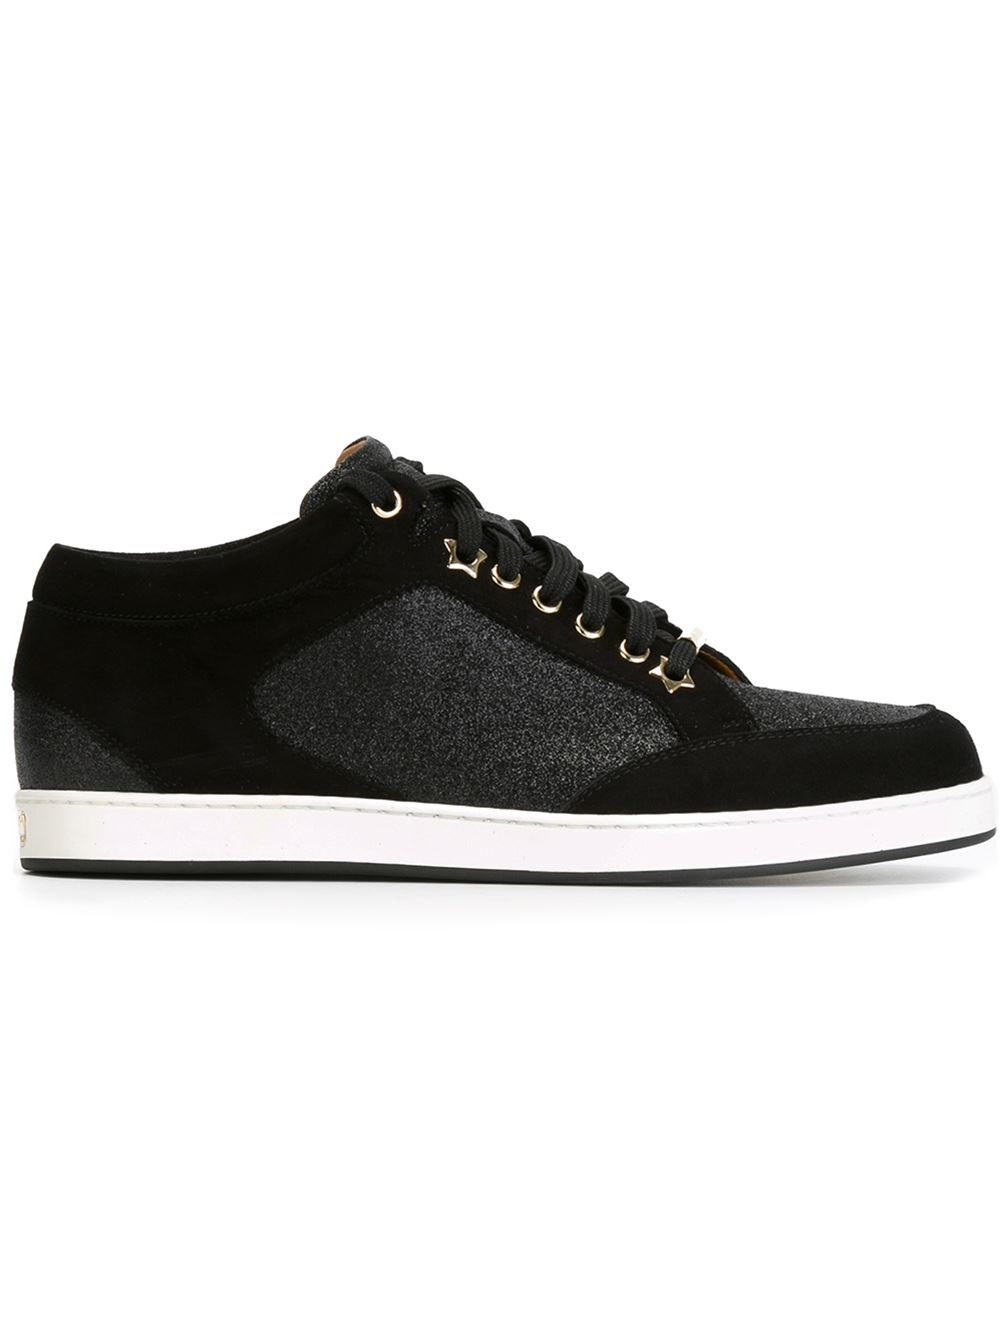 jimmy choo 39 miami 39 sneakers in black lyst. Black Bedroom Furniture Sets. Home Design Ideas